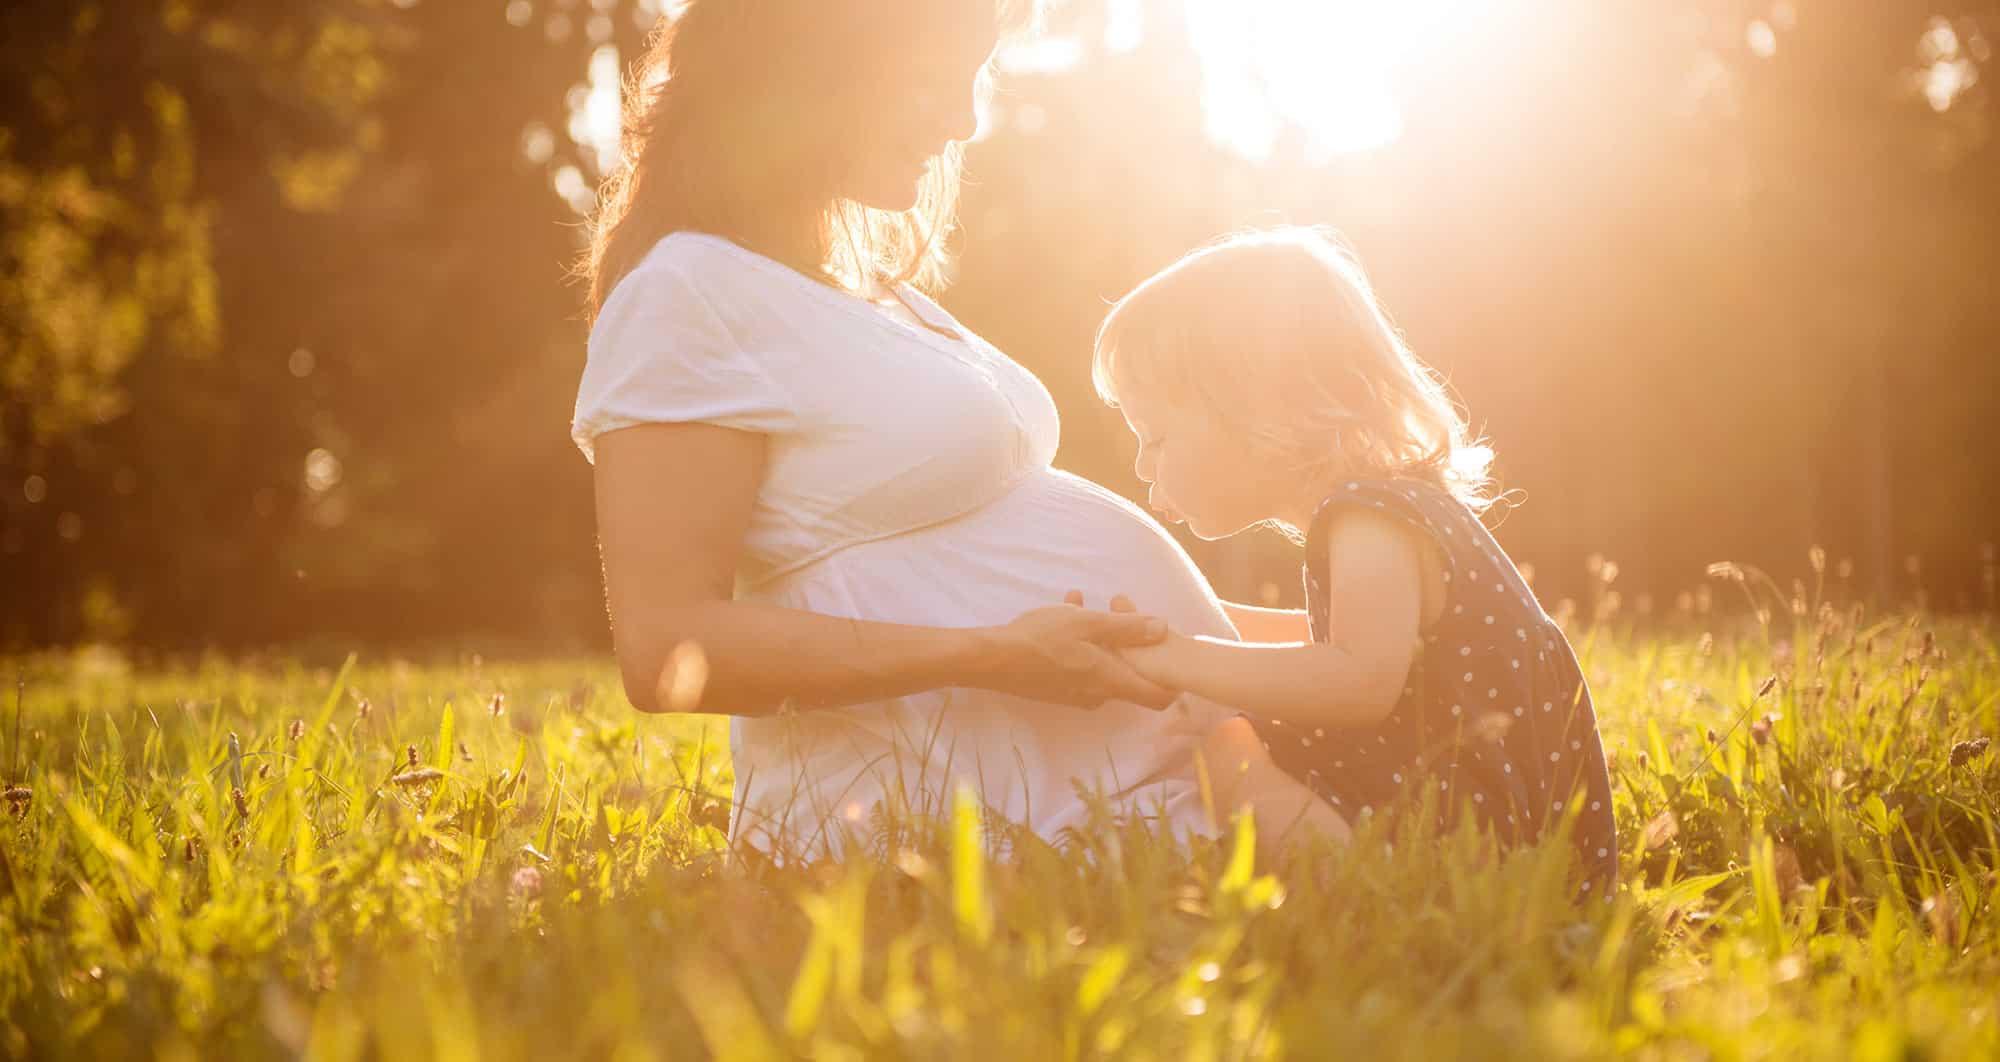 Veritas Fertility & Surgery: Personalized, Compassionate Care